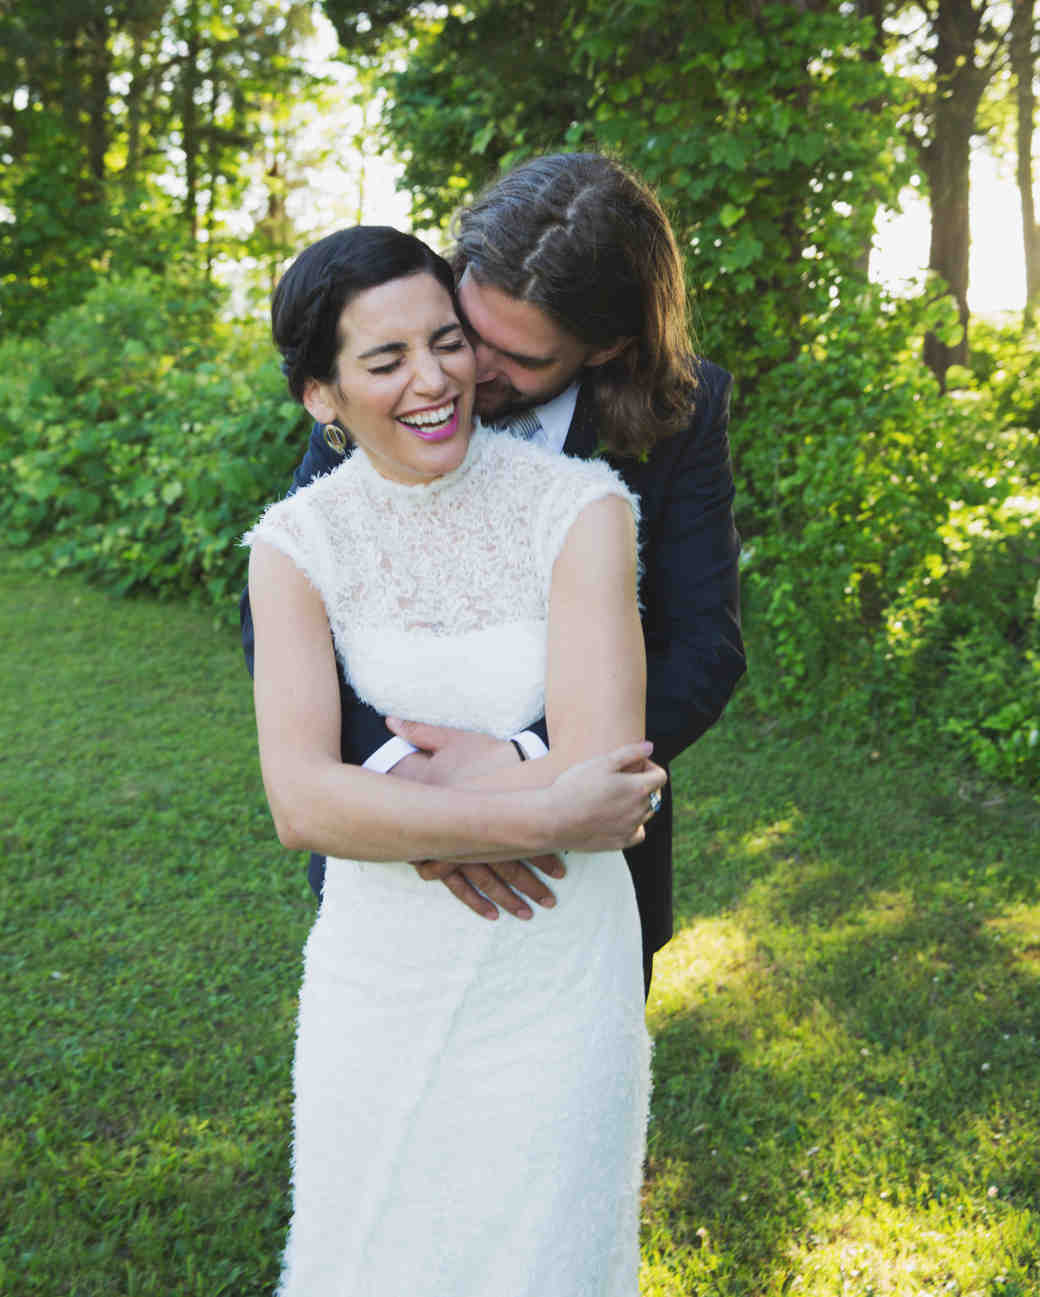 lilly-carter-wedding-hug-00228-s112037-0715.jpg